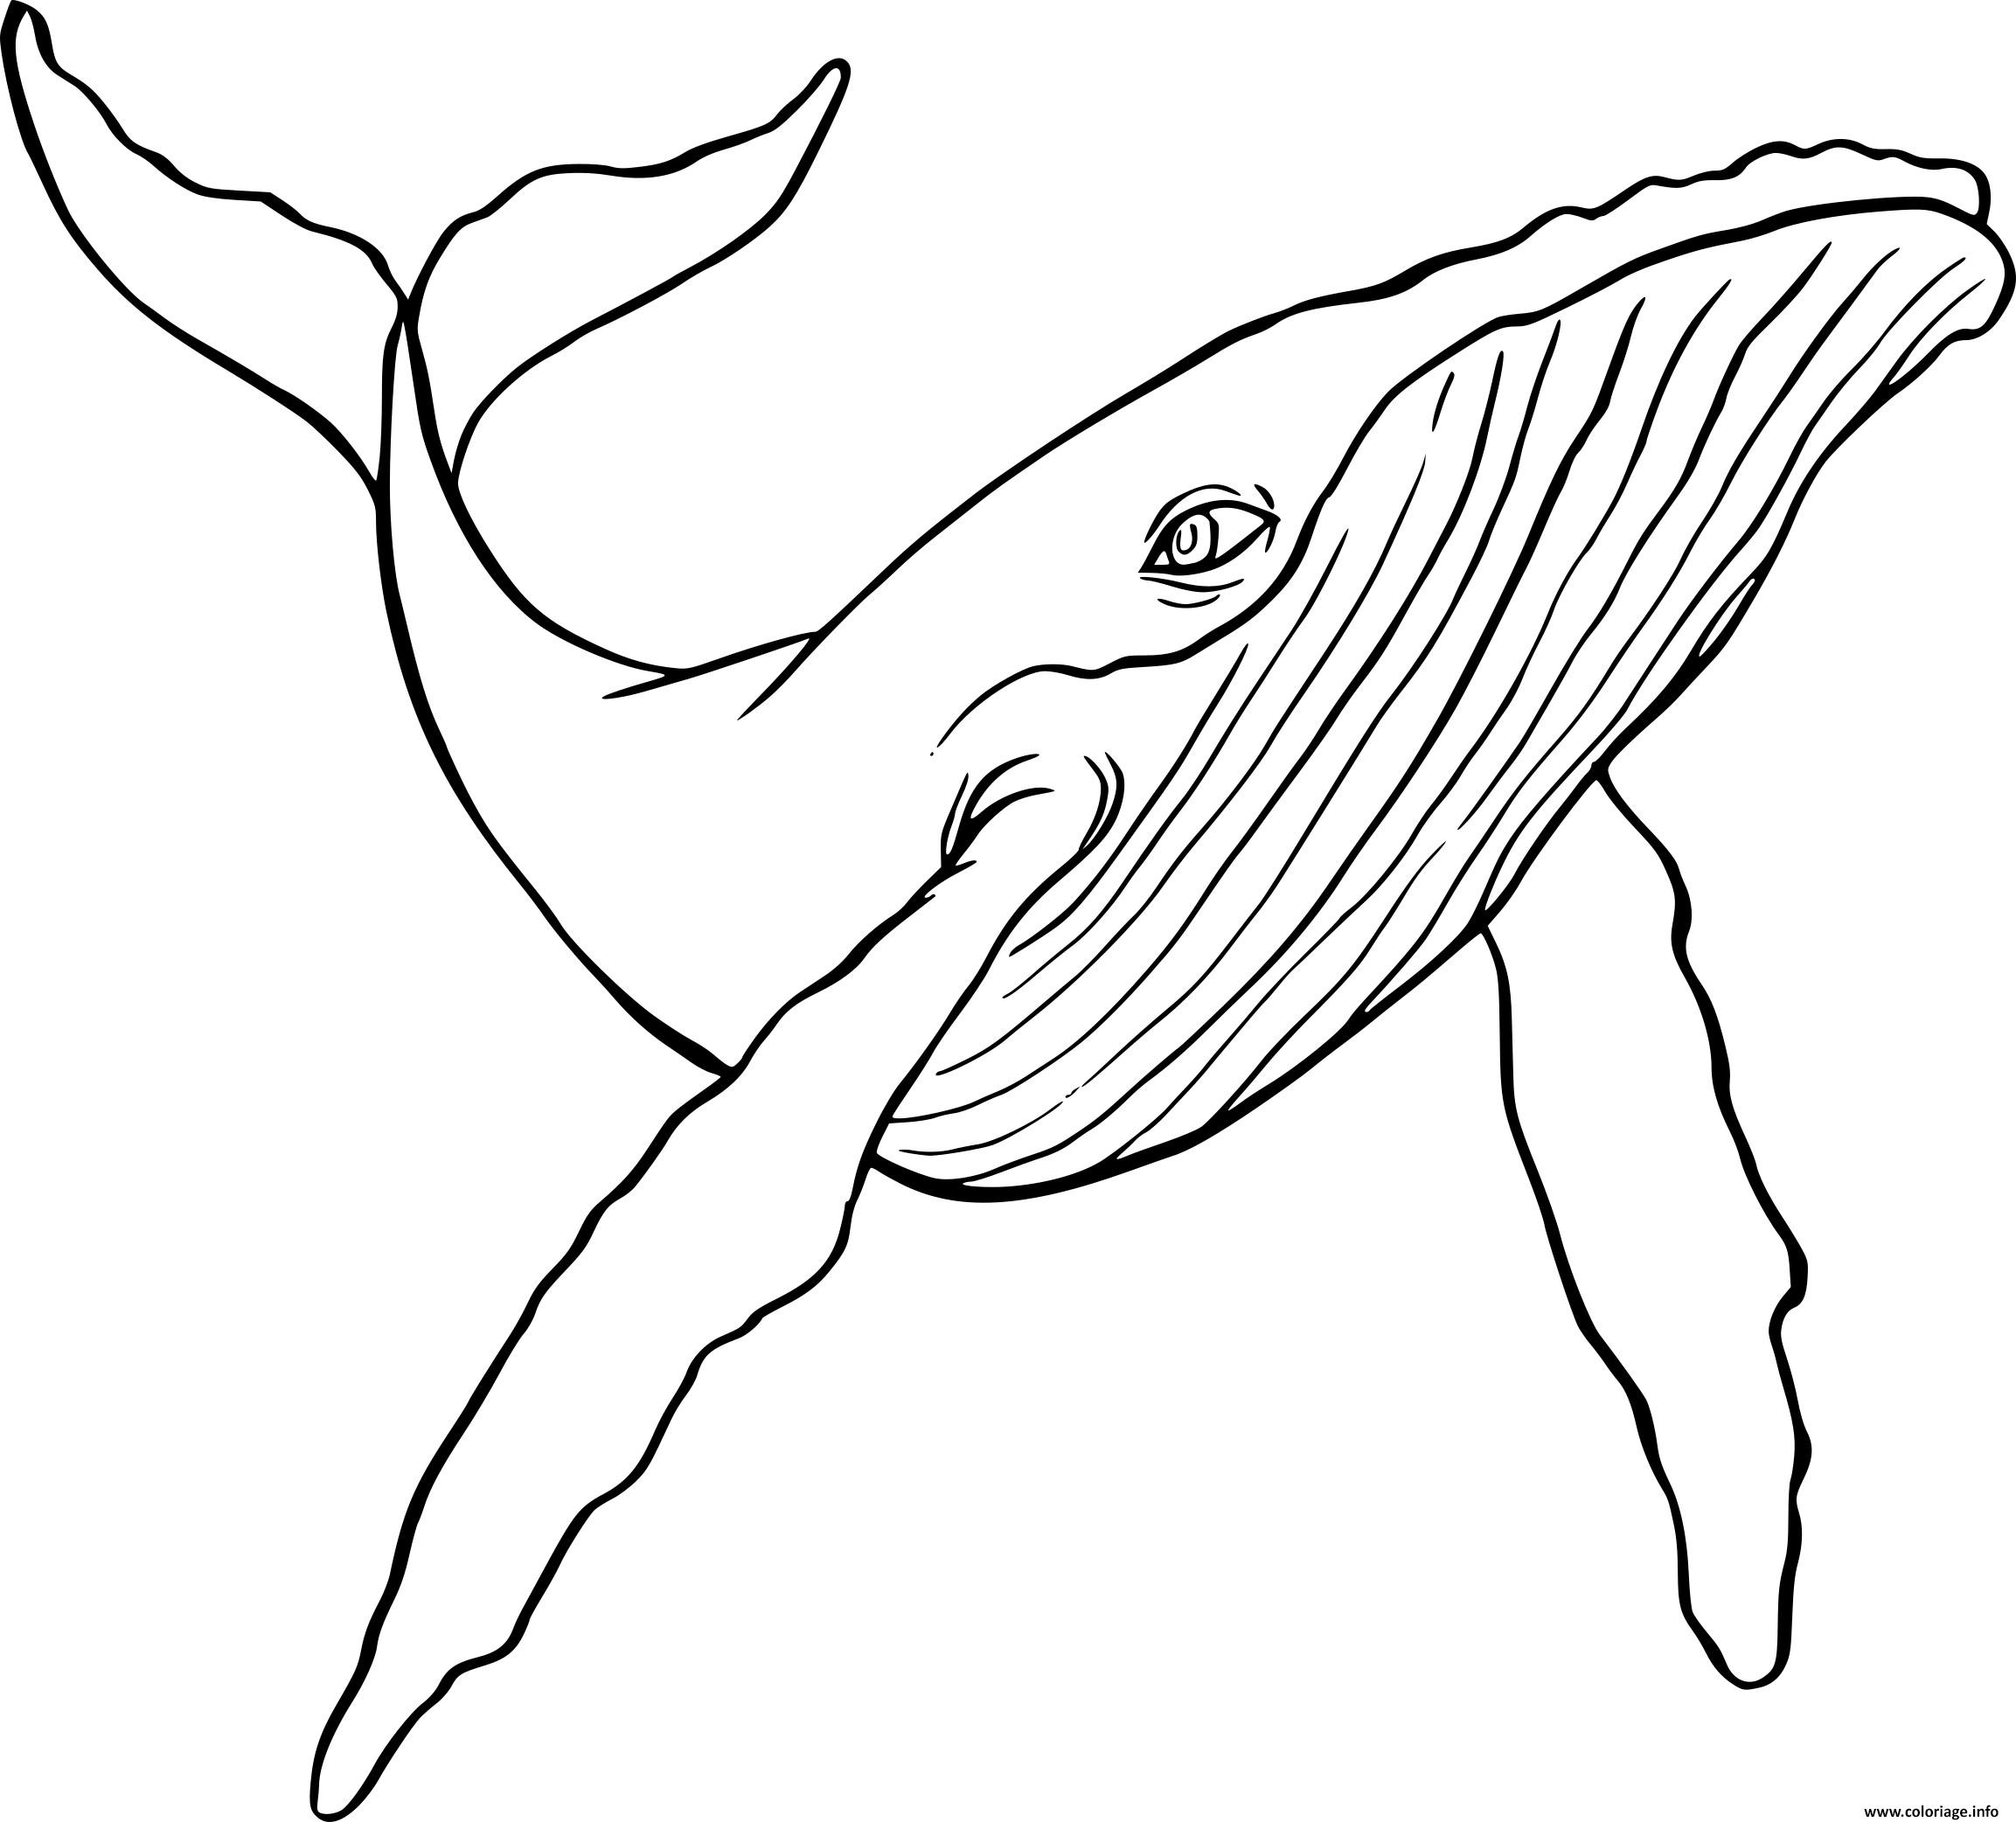 Coloriage Baleine En Ligne.Coloriage Baleine A Bosse Dessin